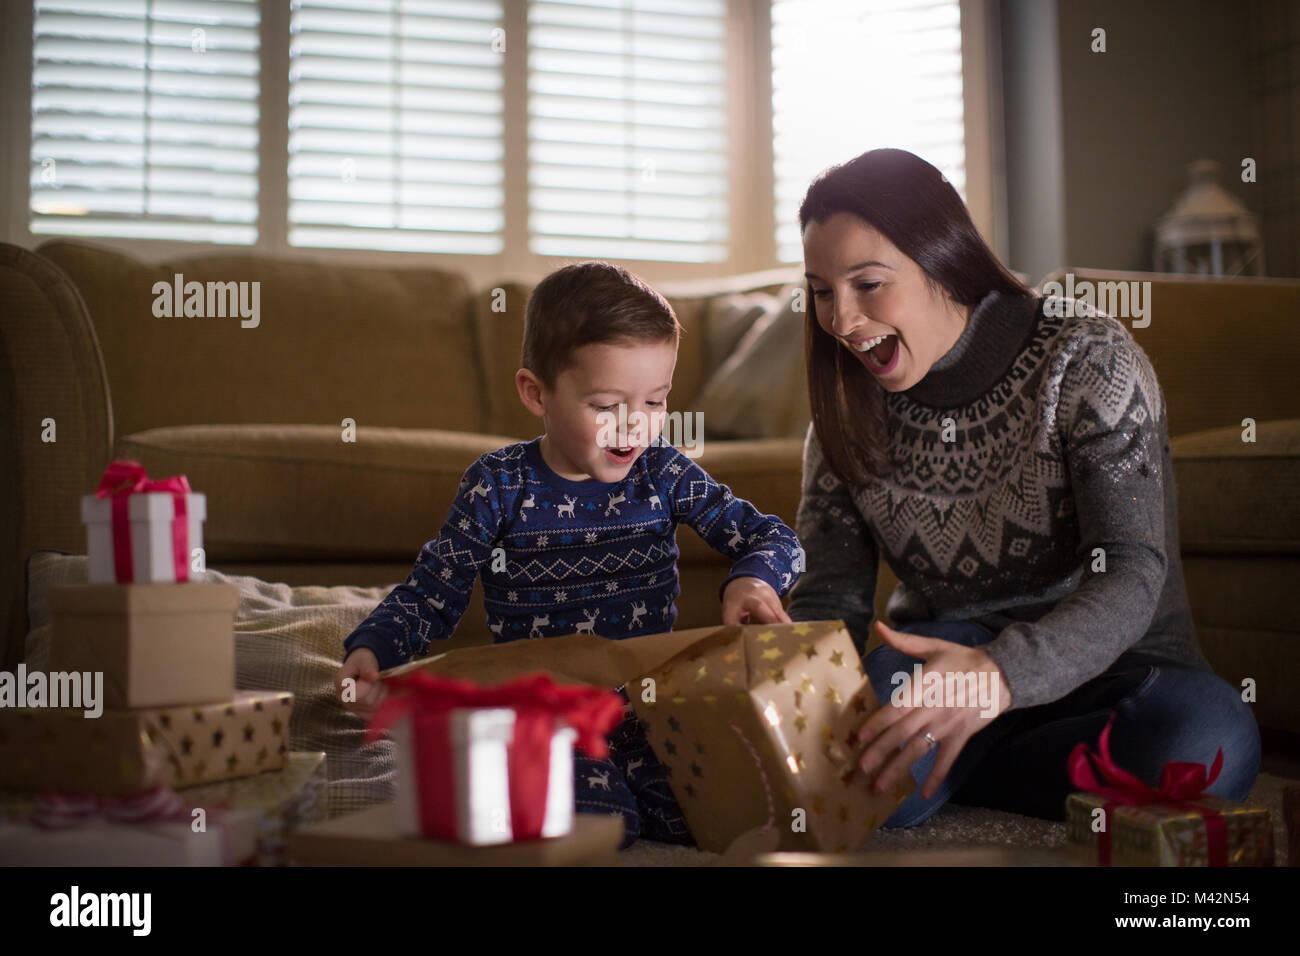 Madre e hijo desenvolviendo regalos de Navidad Imagen De Stock